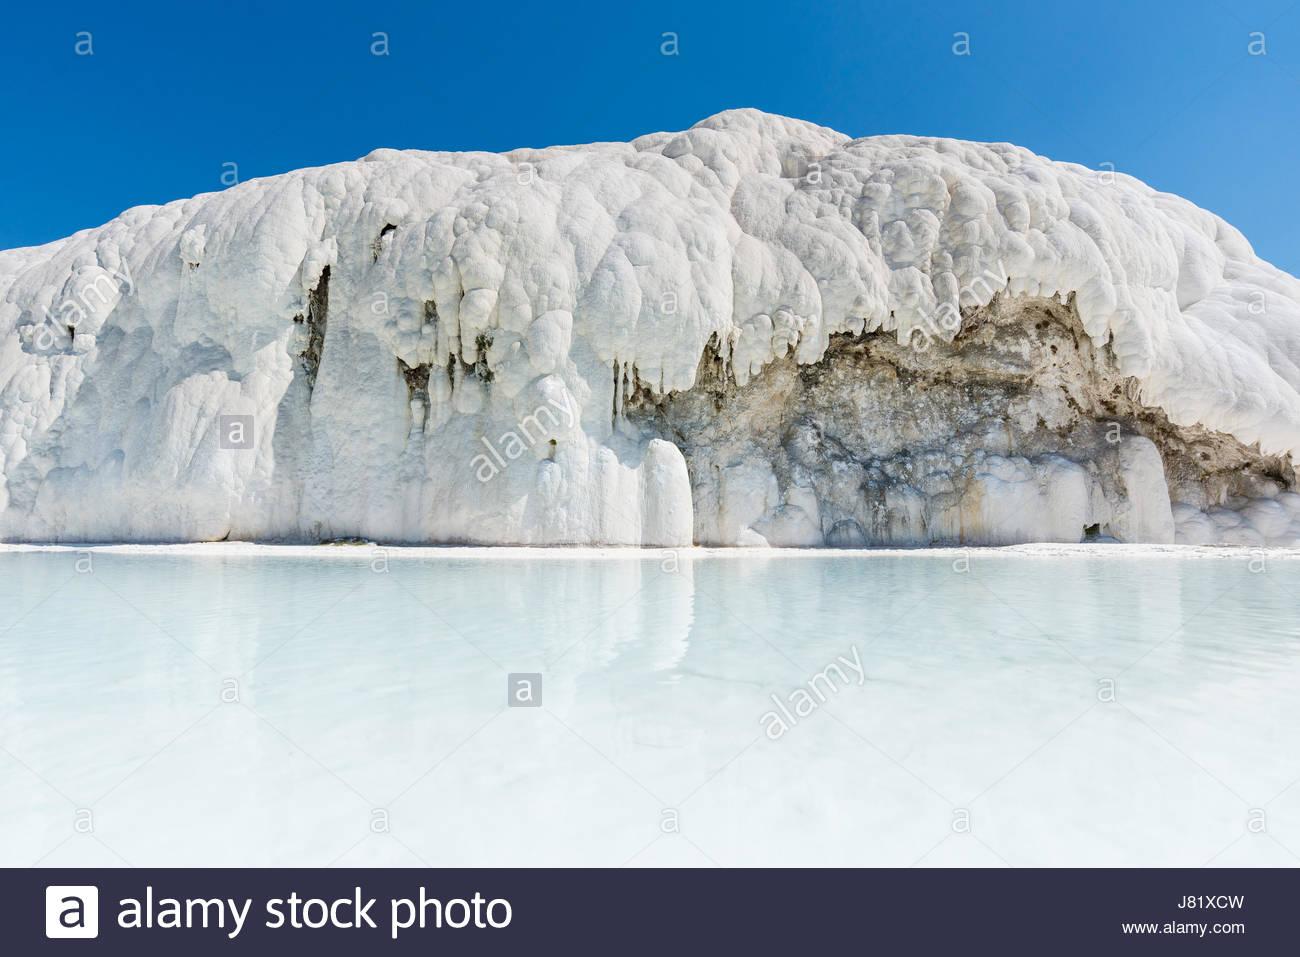 "Travertino natural piscinas y terrazas en Pamukkale, Turquía. Pamukkale, que significa ""castillo de algodón"" Imagen De Stock"